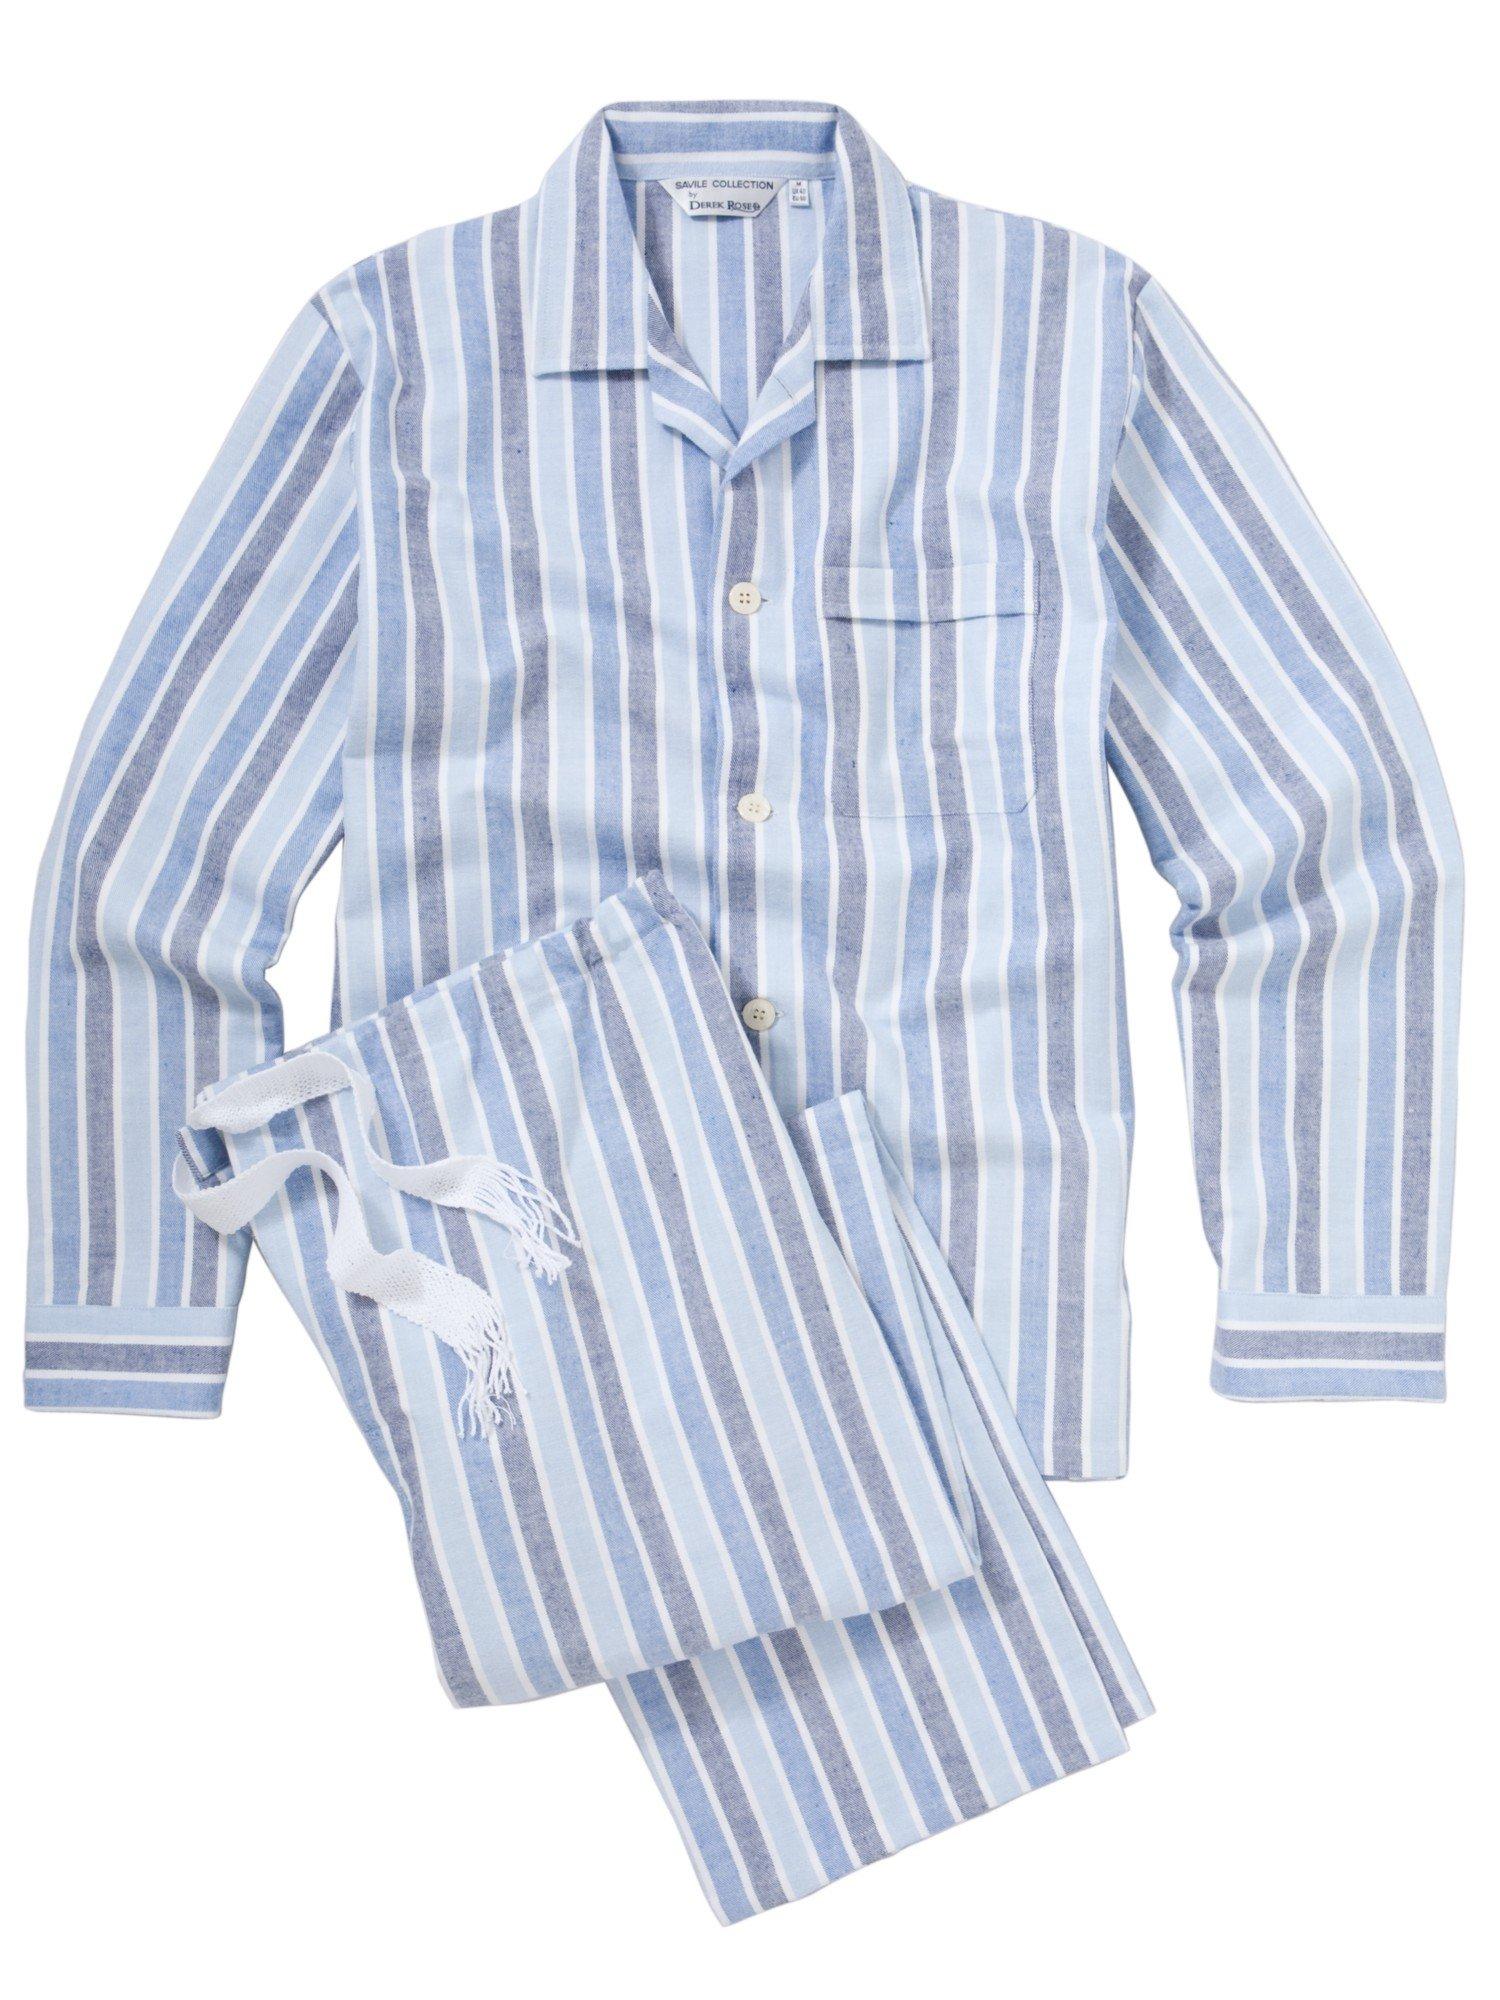 Powell Craft - Boys Blue Striped Pyjamas | Childrensalon